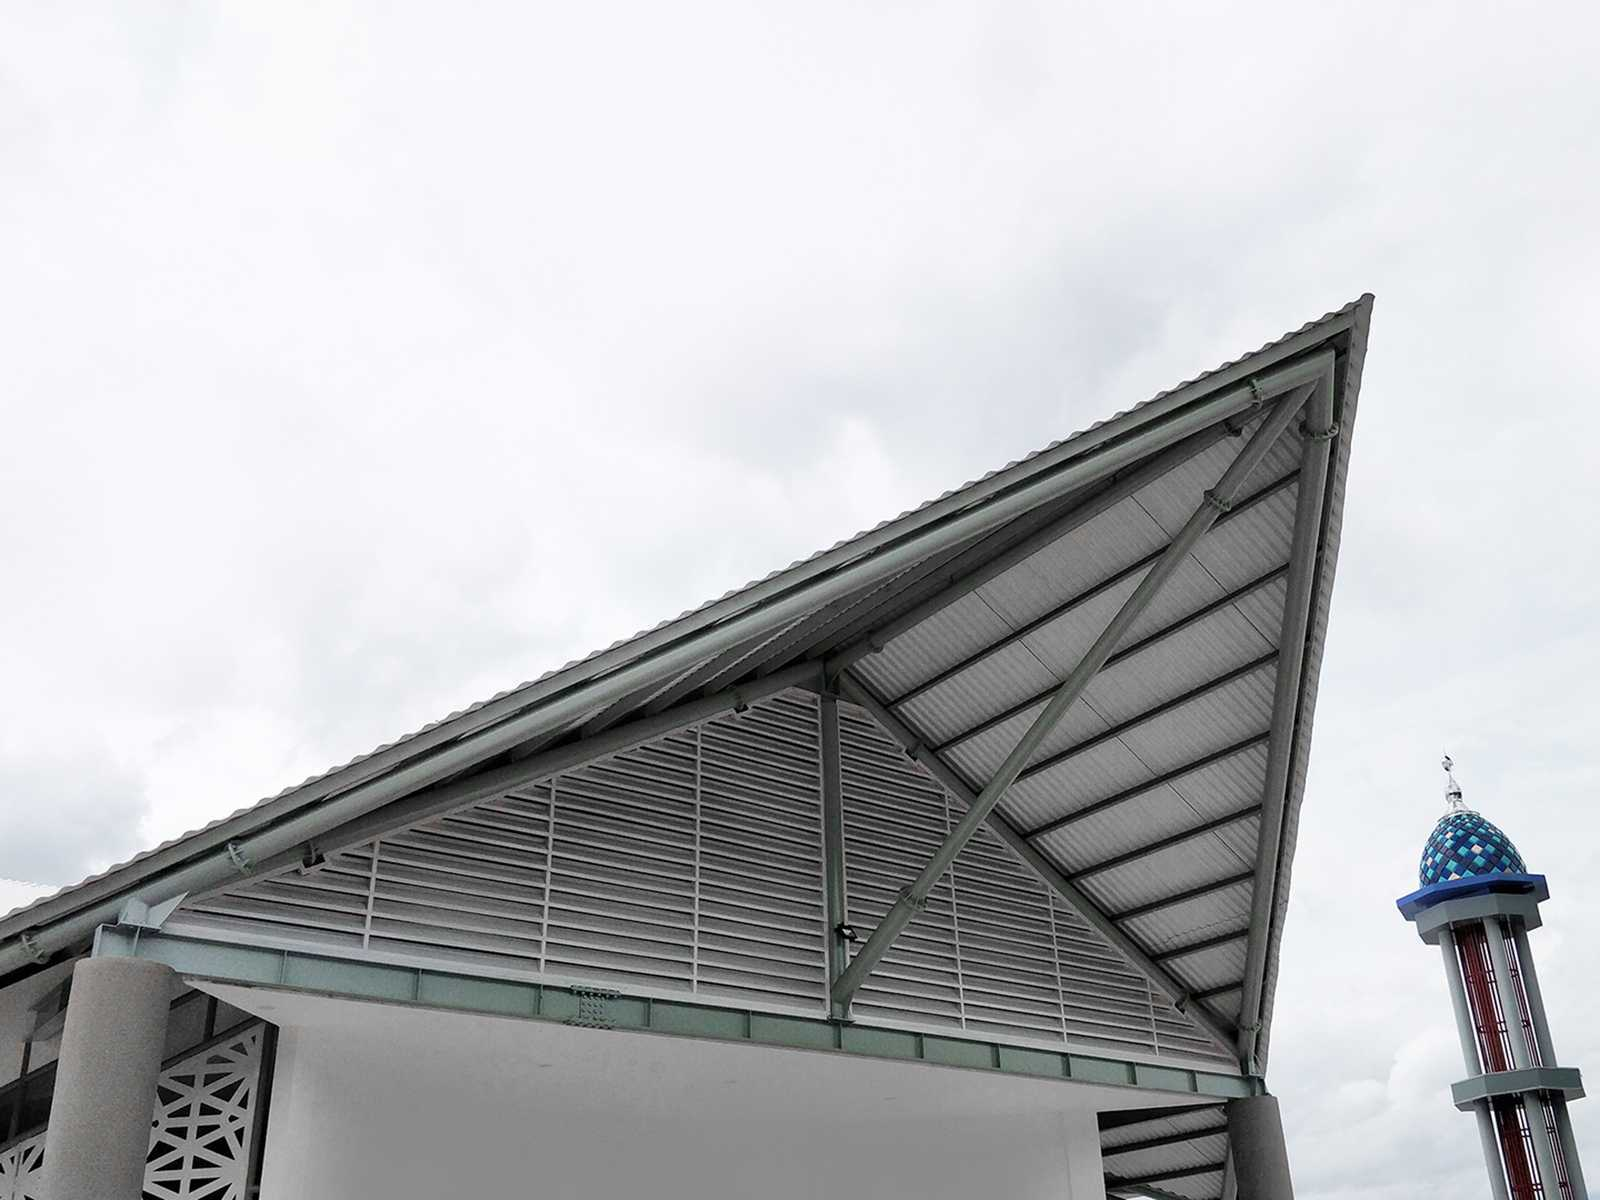 Bramasta Redy Masjid Apung Amahami Bima, Nusa Tenggara Bar., Indonesia Bima, Nusa Tenggara Bar., Indonesia Atap  65767